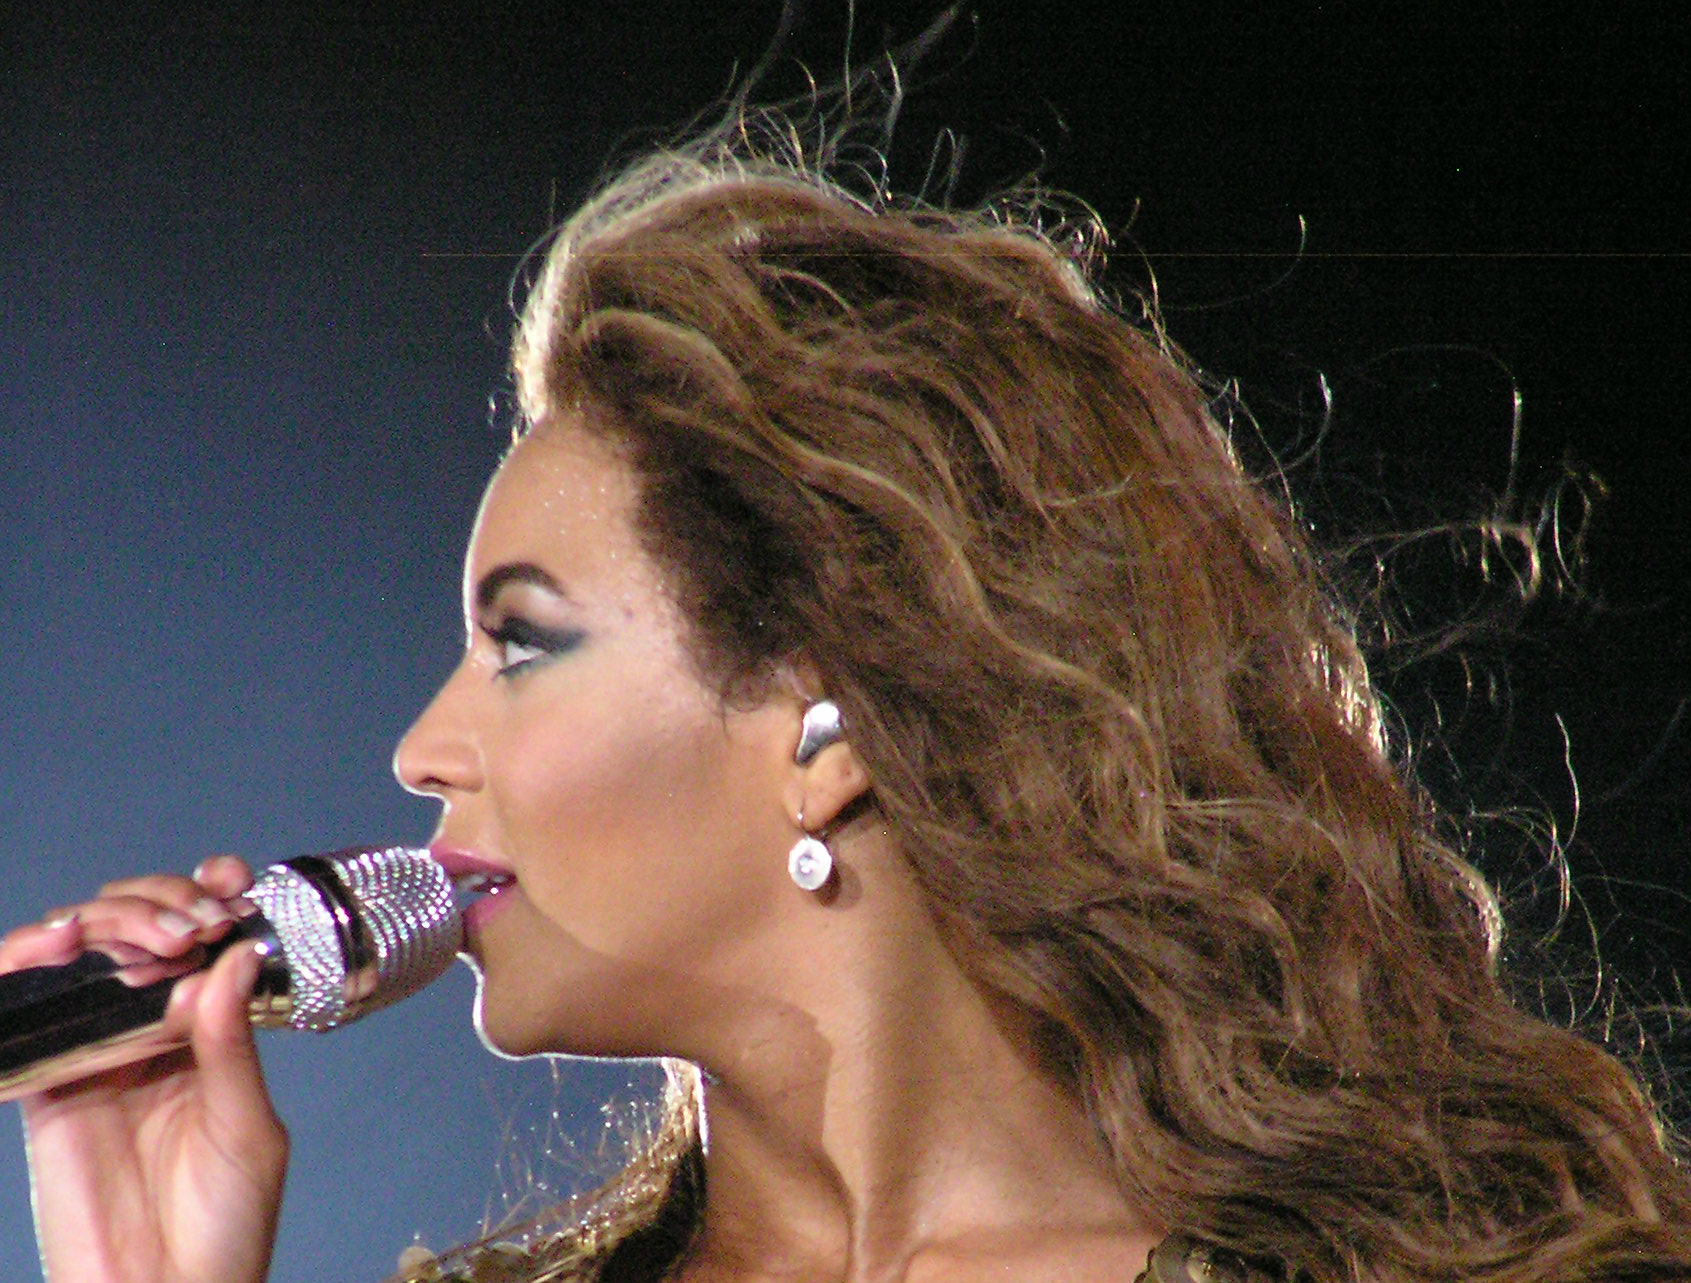 American singer